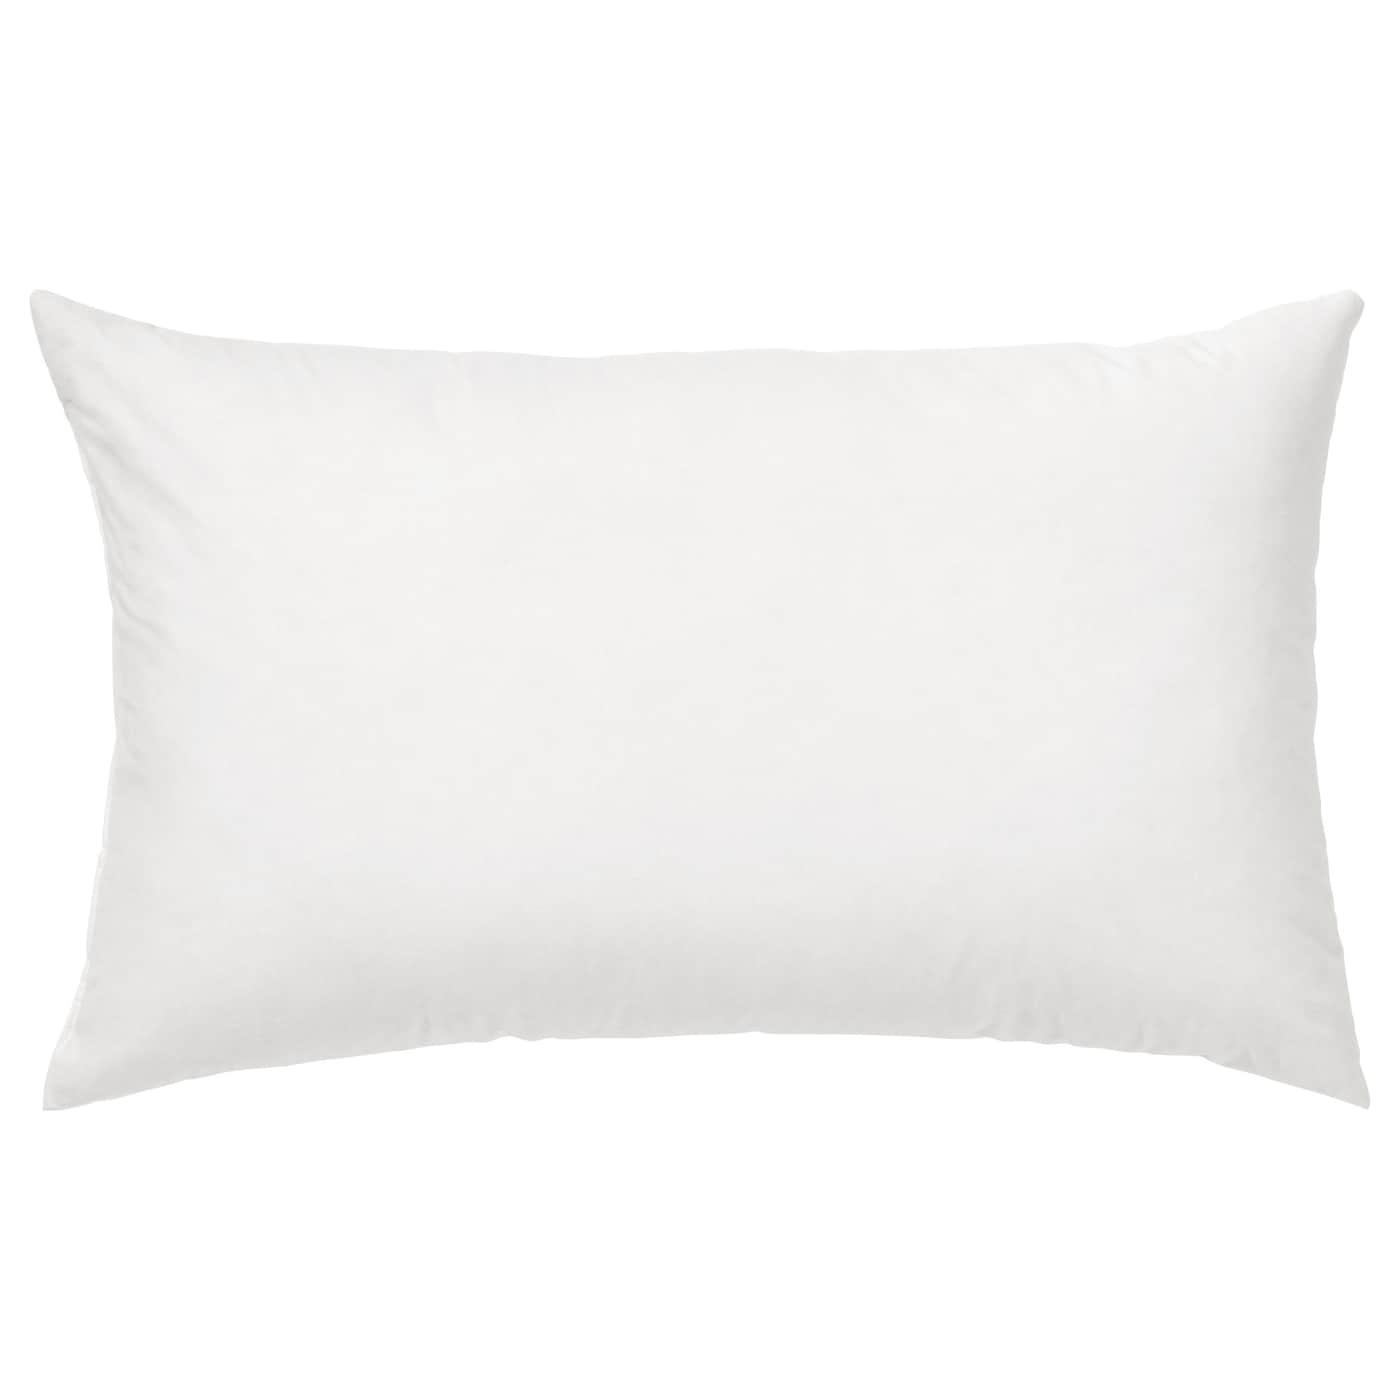 GULLINGEN Funda de cojín Int/ext/beige 40 x 65 cm - IKEA